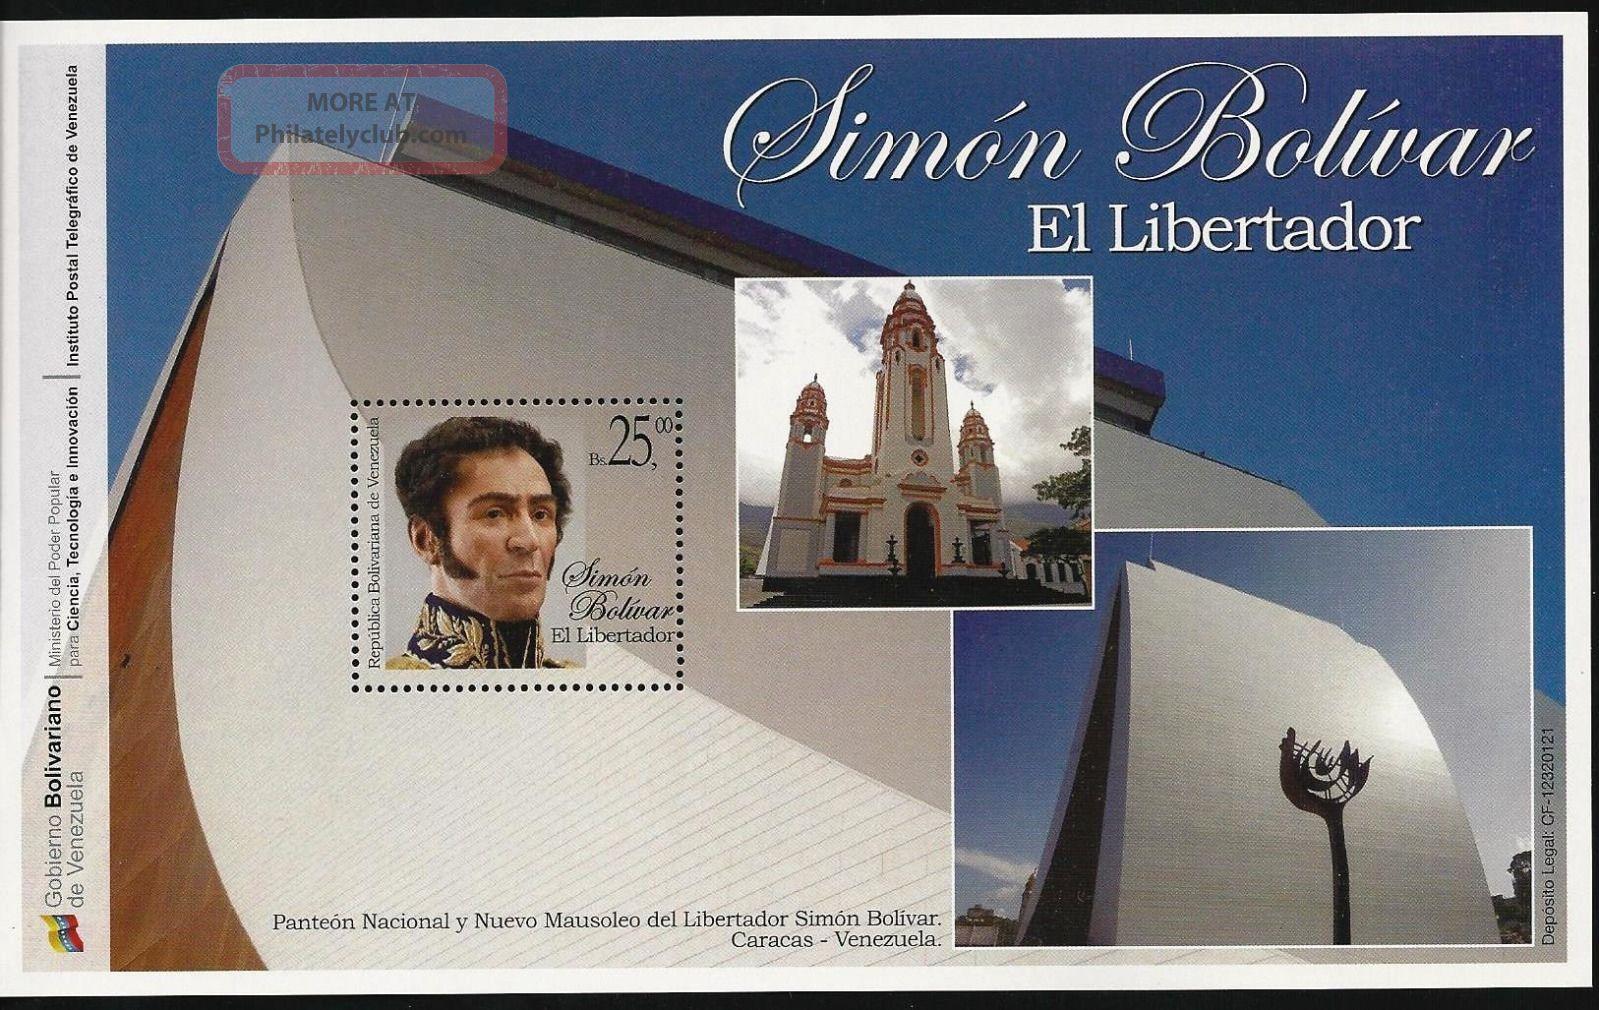 Venezuela 2012 Simon Bolivar - Pantehon And Mausole - Sheet Souvenir Latin America photo